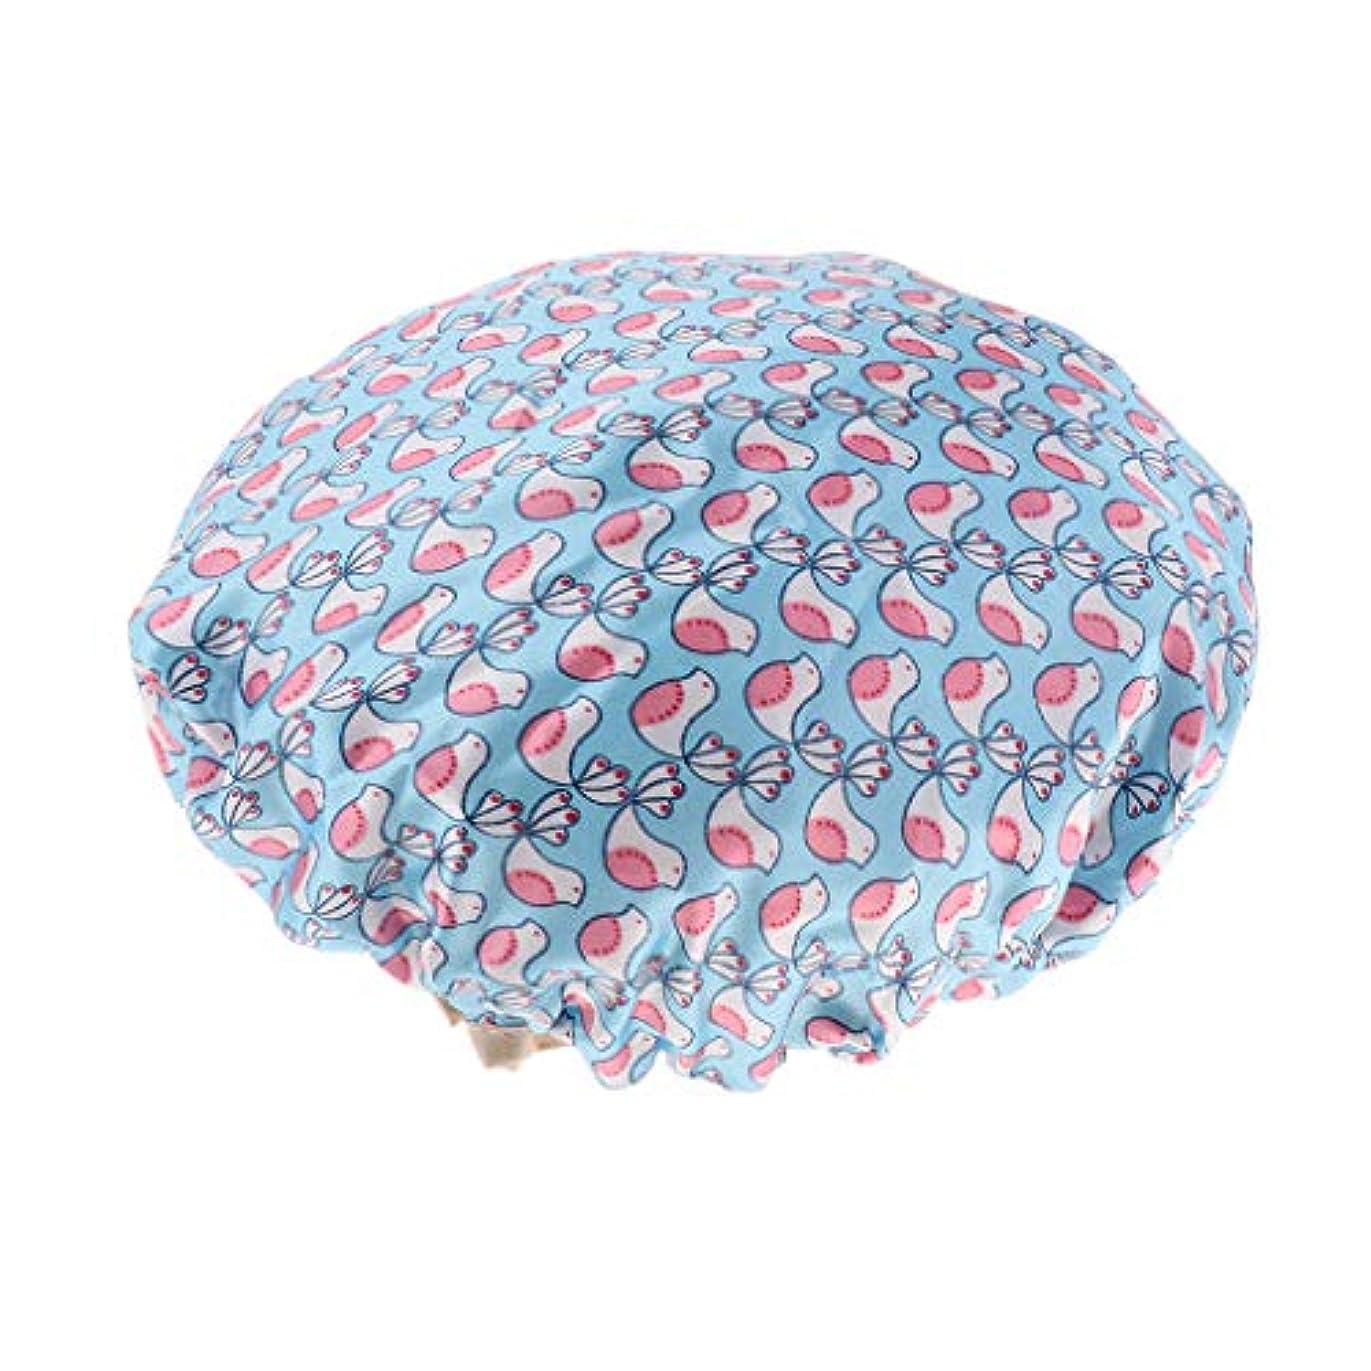 D DOLITY シャワーキャップ ヘアキャップ 帽子 女性用 入浴 バス用品 二重層 防水 全3色 - 青